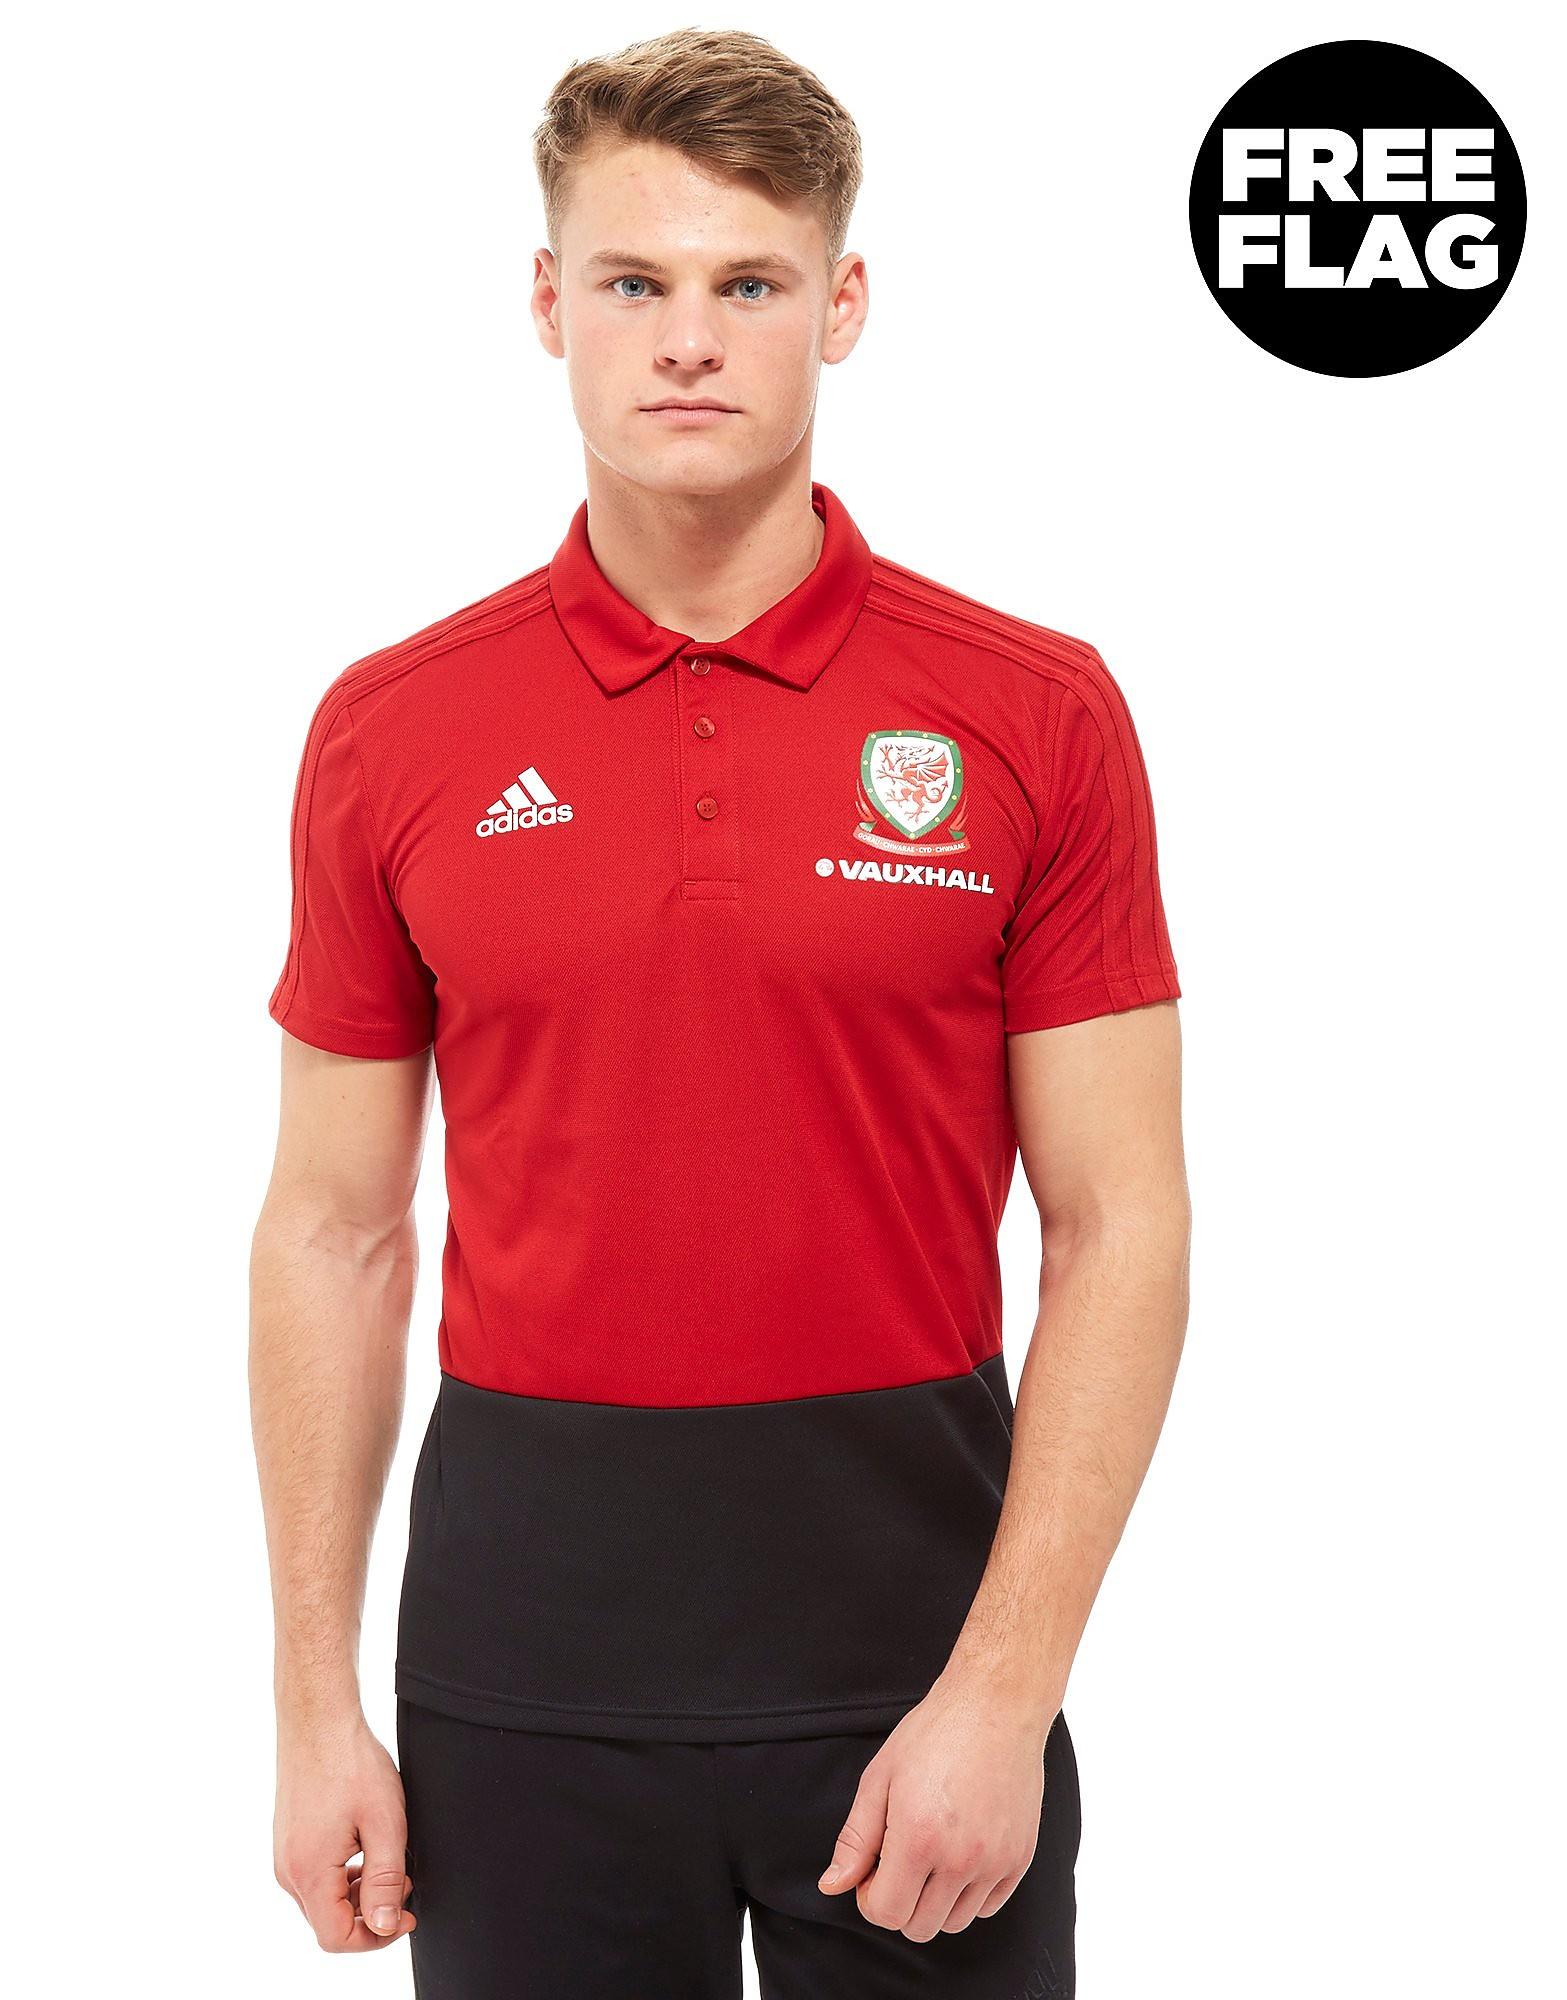 adidas FA Wales 2018 Polo Shirt Heren - Rood - Heren